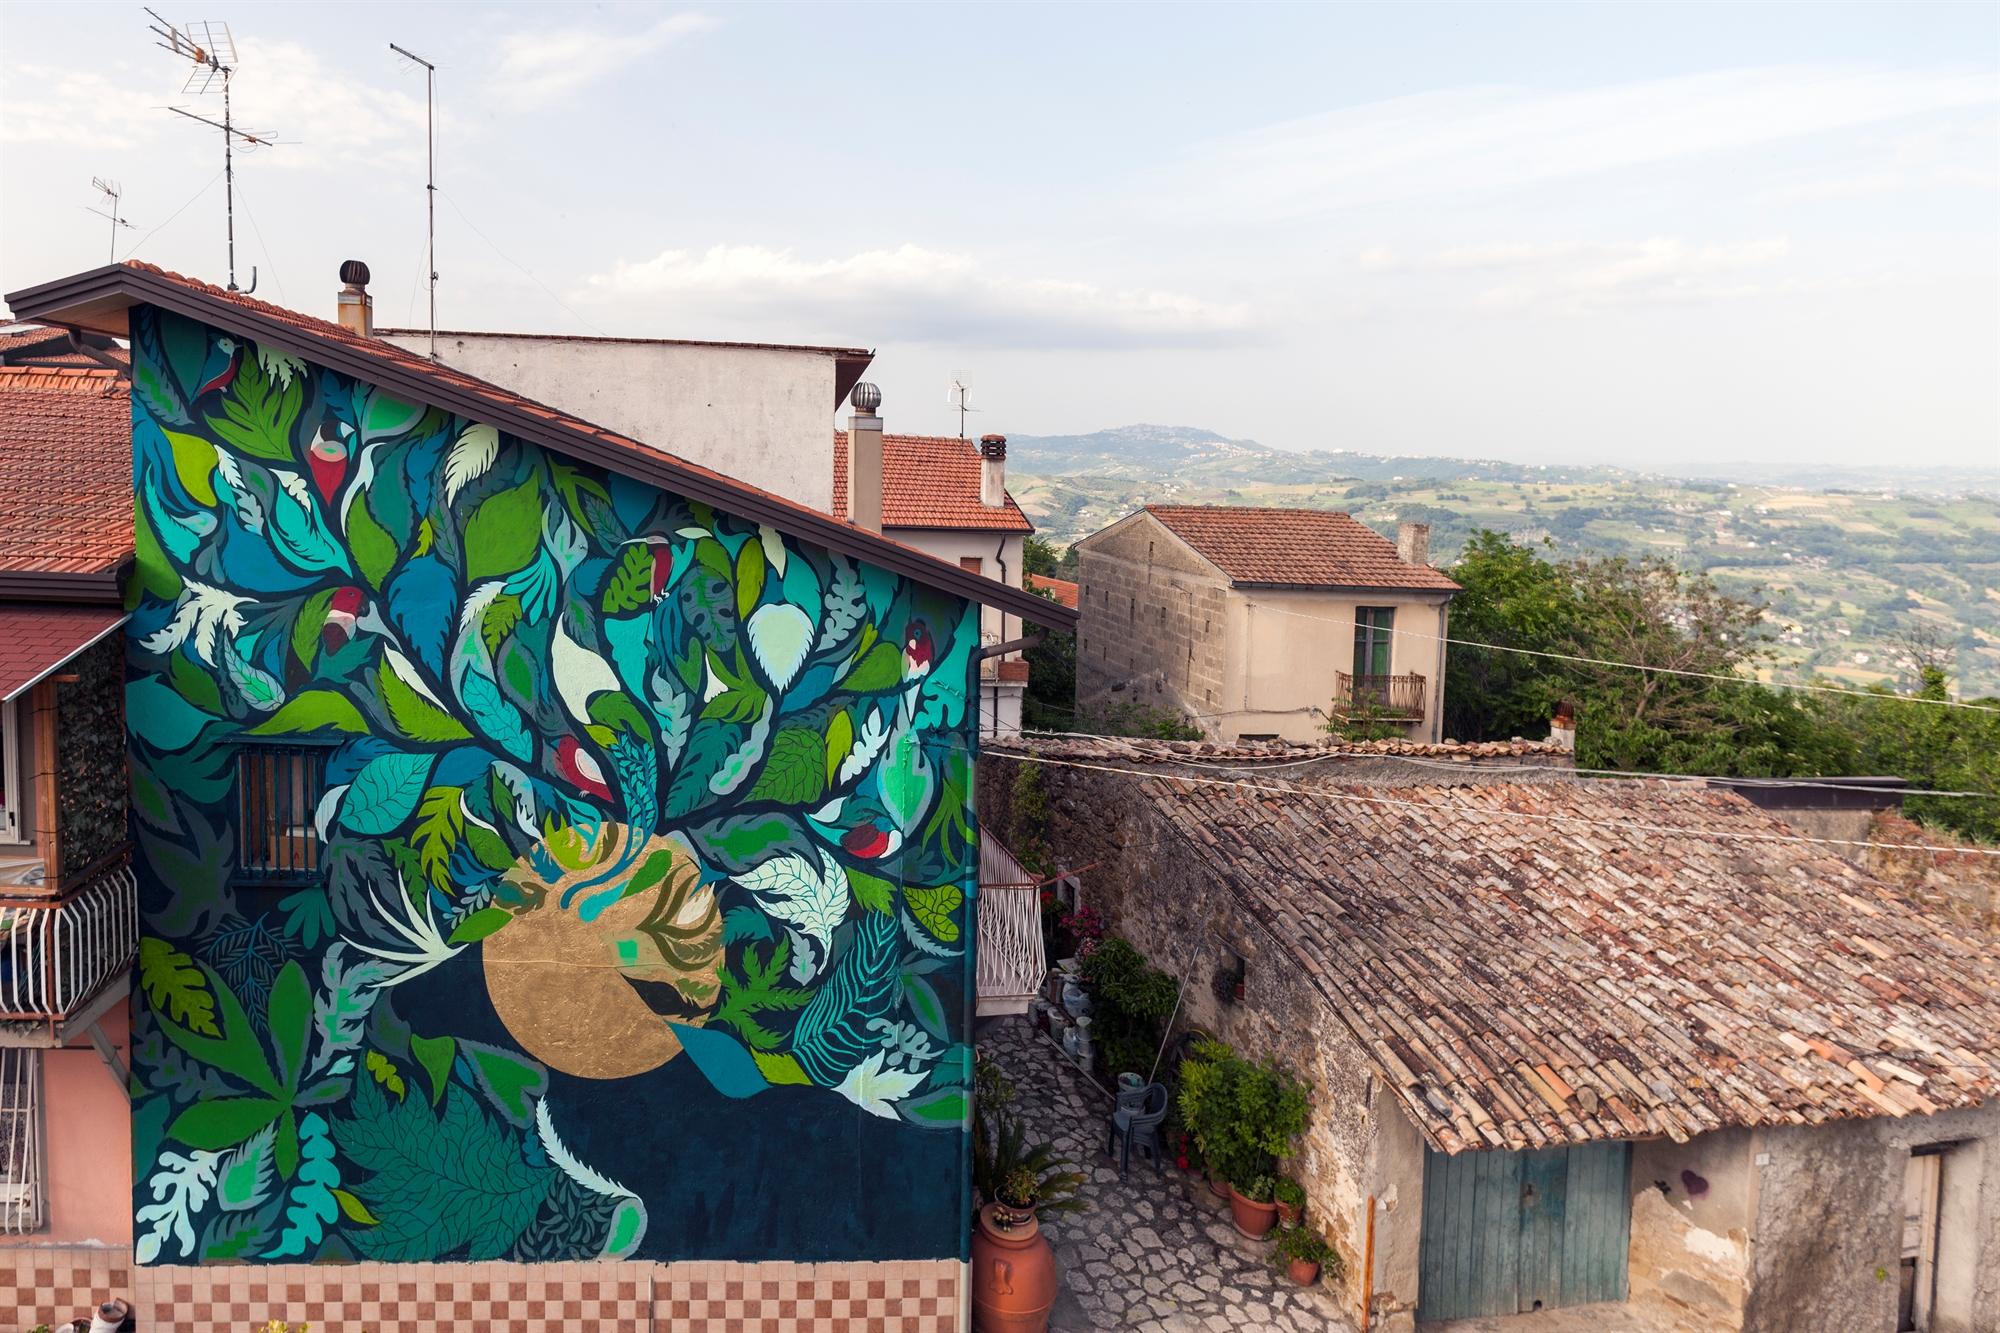 5 street artists meet the art of Salvatore Ferragamo